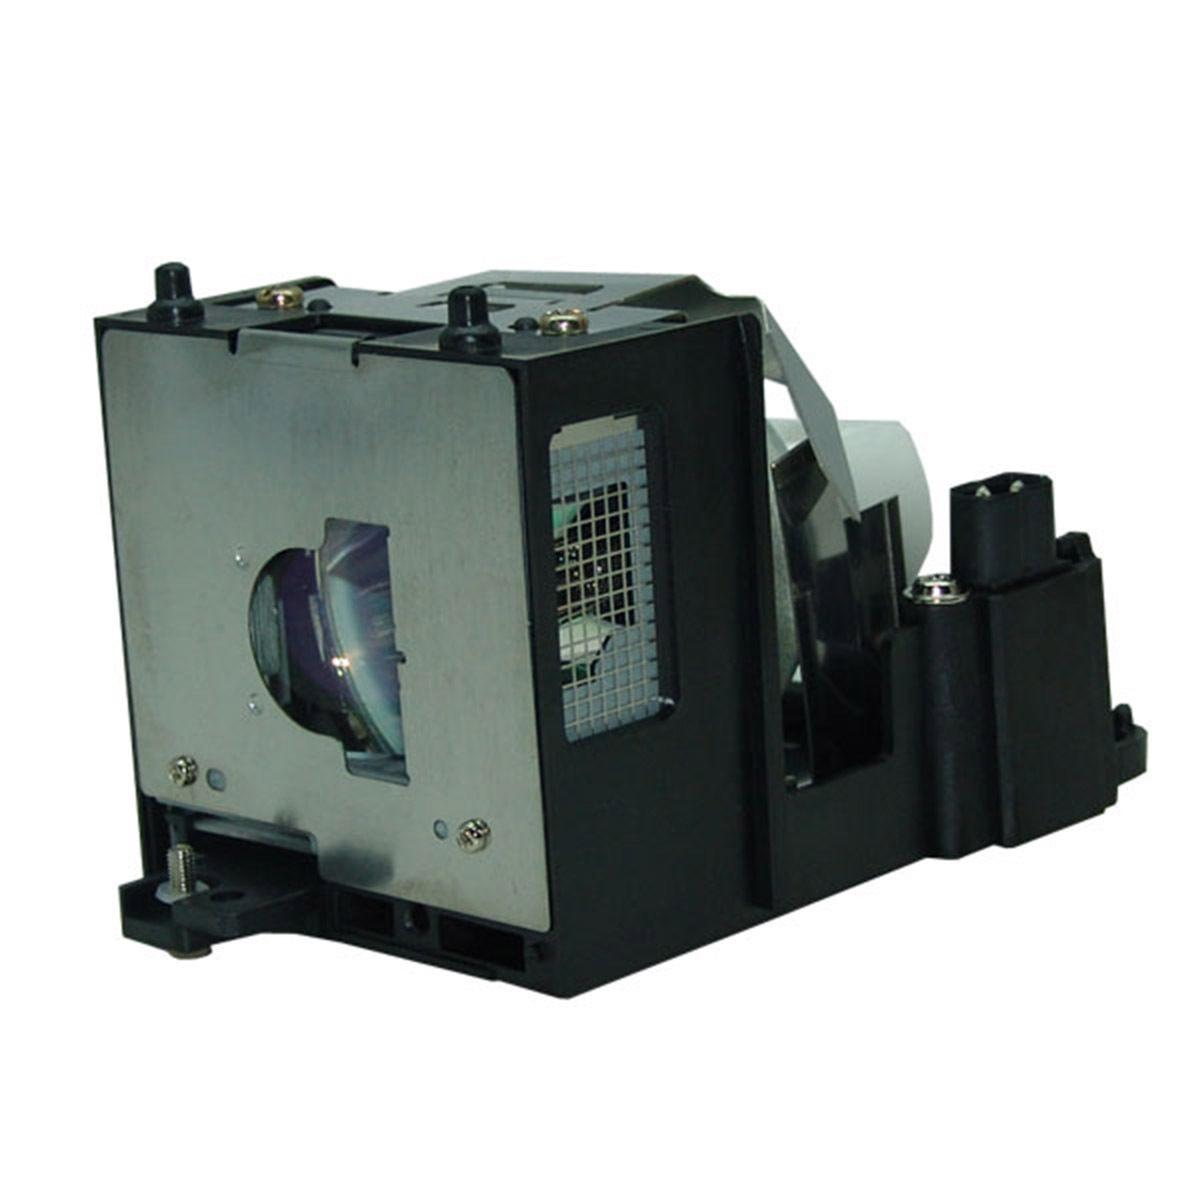 ФОТО SHP93 AN-XR10LP Lamp for Sharp XR-10SA 20SA 12SA 22SA 2020X 2030S XG-MB50X XR-105 XR-10S XR-10X XR-HB007X Projector Lamp Bulb